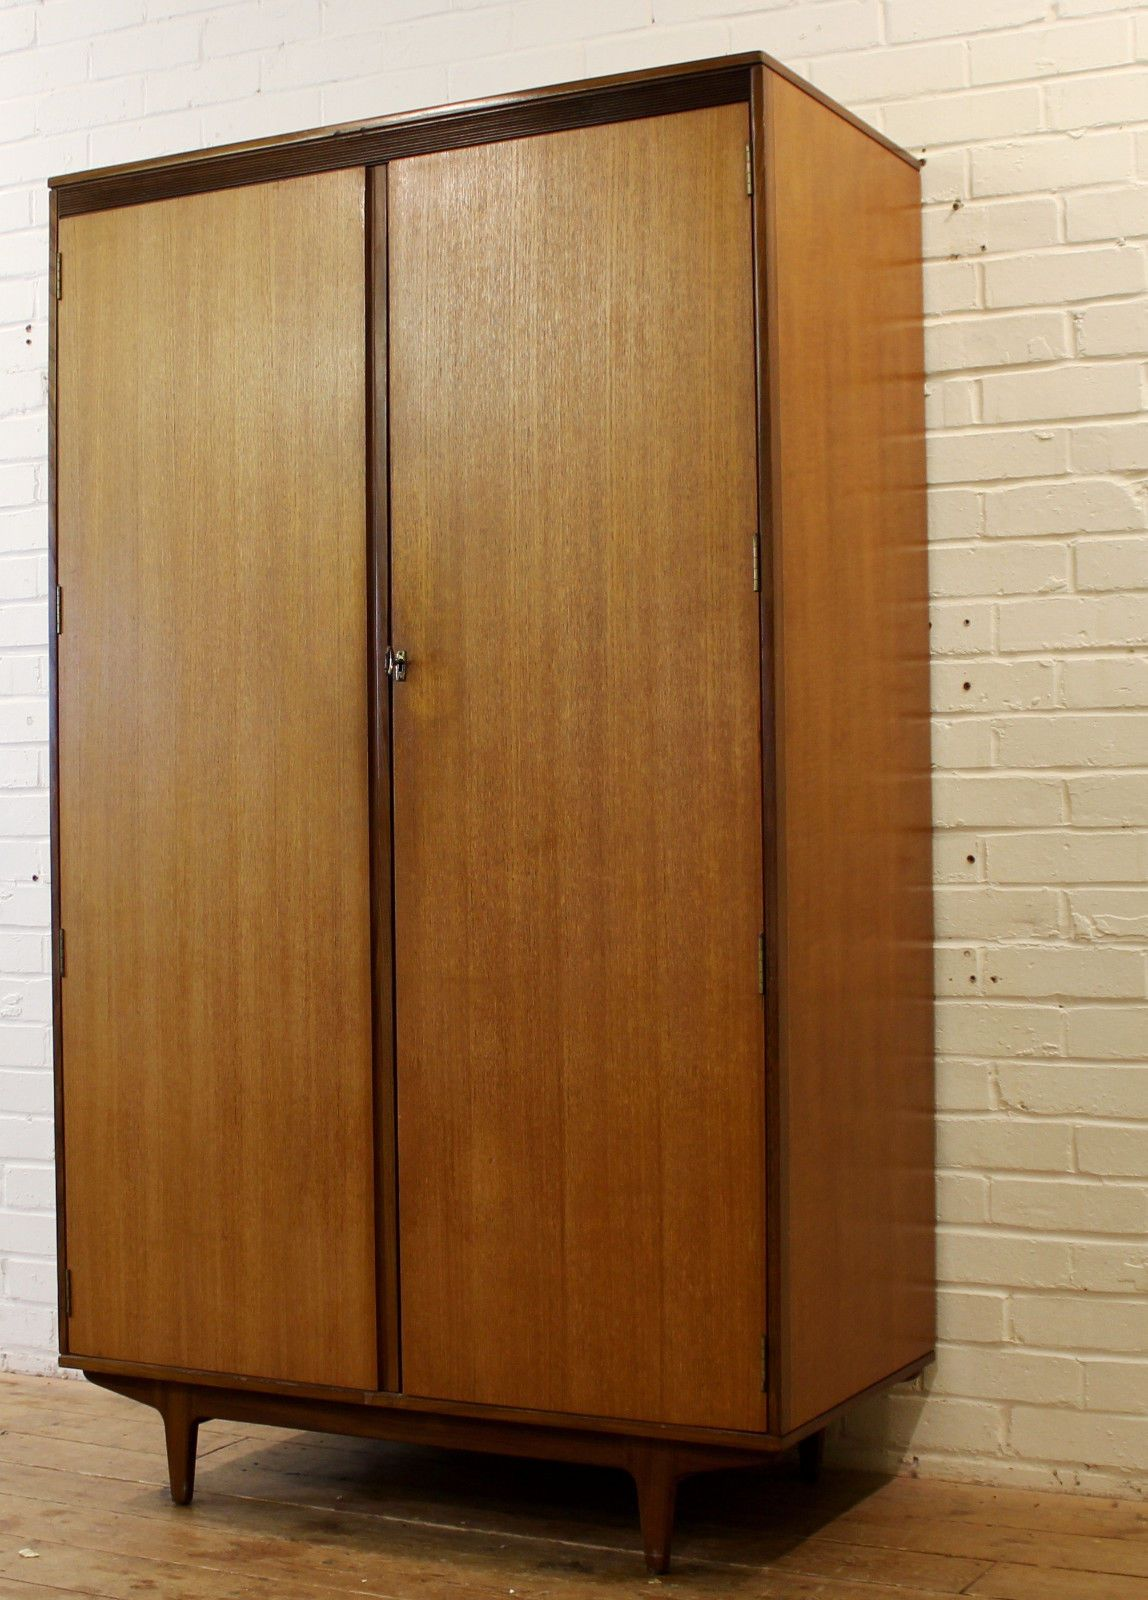 Vintage Striking Teak #gents Wardrobe With #storage U002760s Retro Bedroom  #furniture, View More On The LINK:  Http://www.zeppy.io/product/gb/2/291894967914/